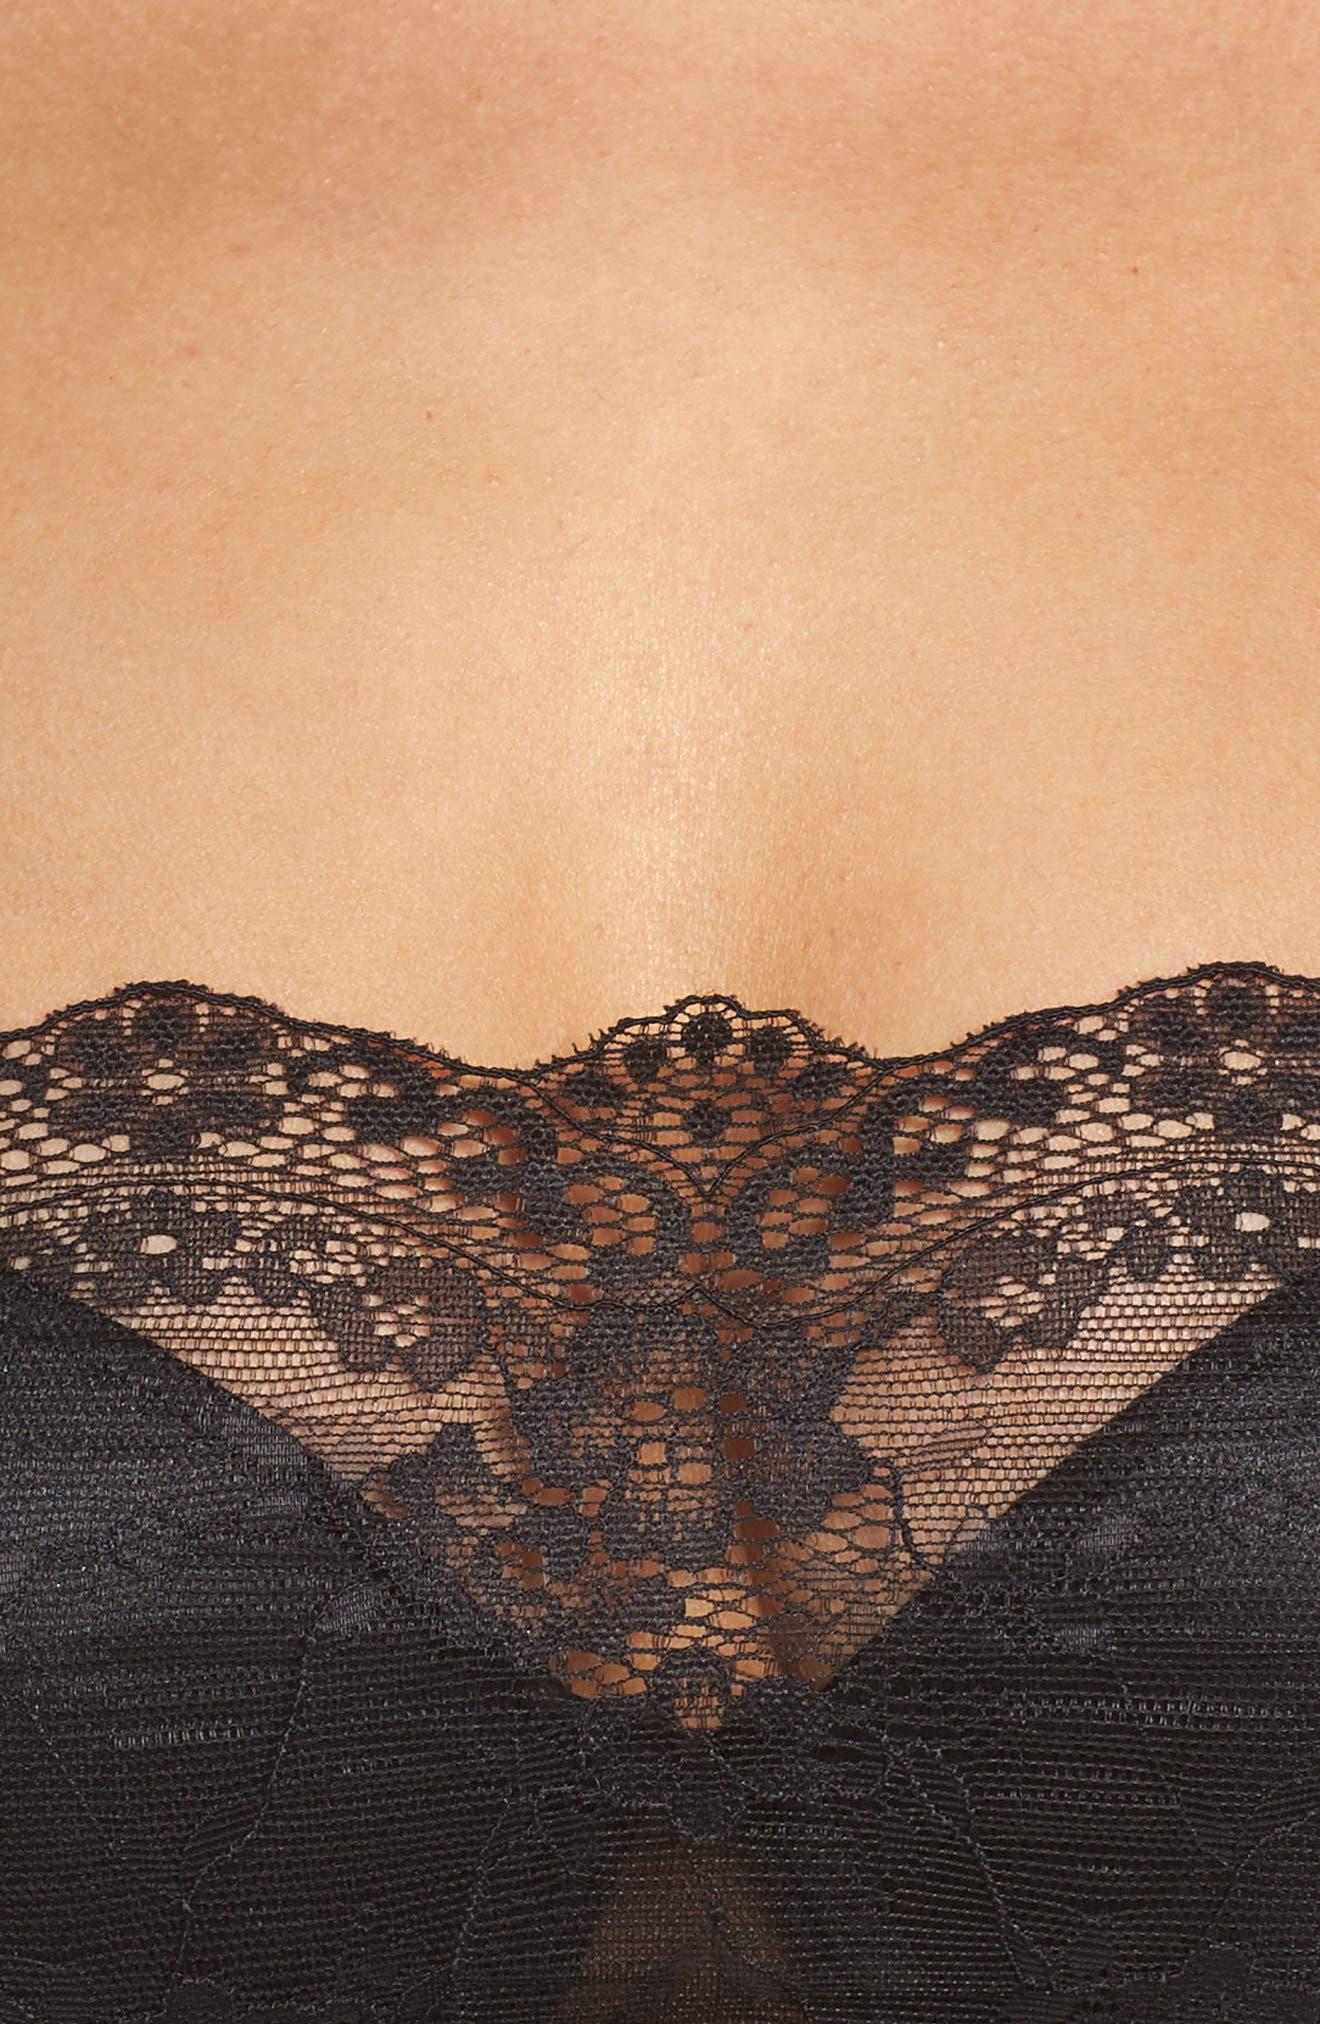 NORDSTROM LINGERIE,                             Backless Strapless Underwire Bandeau Bra,                             Alternate thumbnail 4, color,                             BLACK